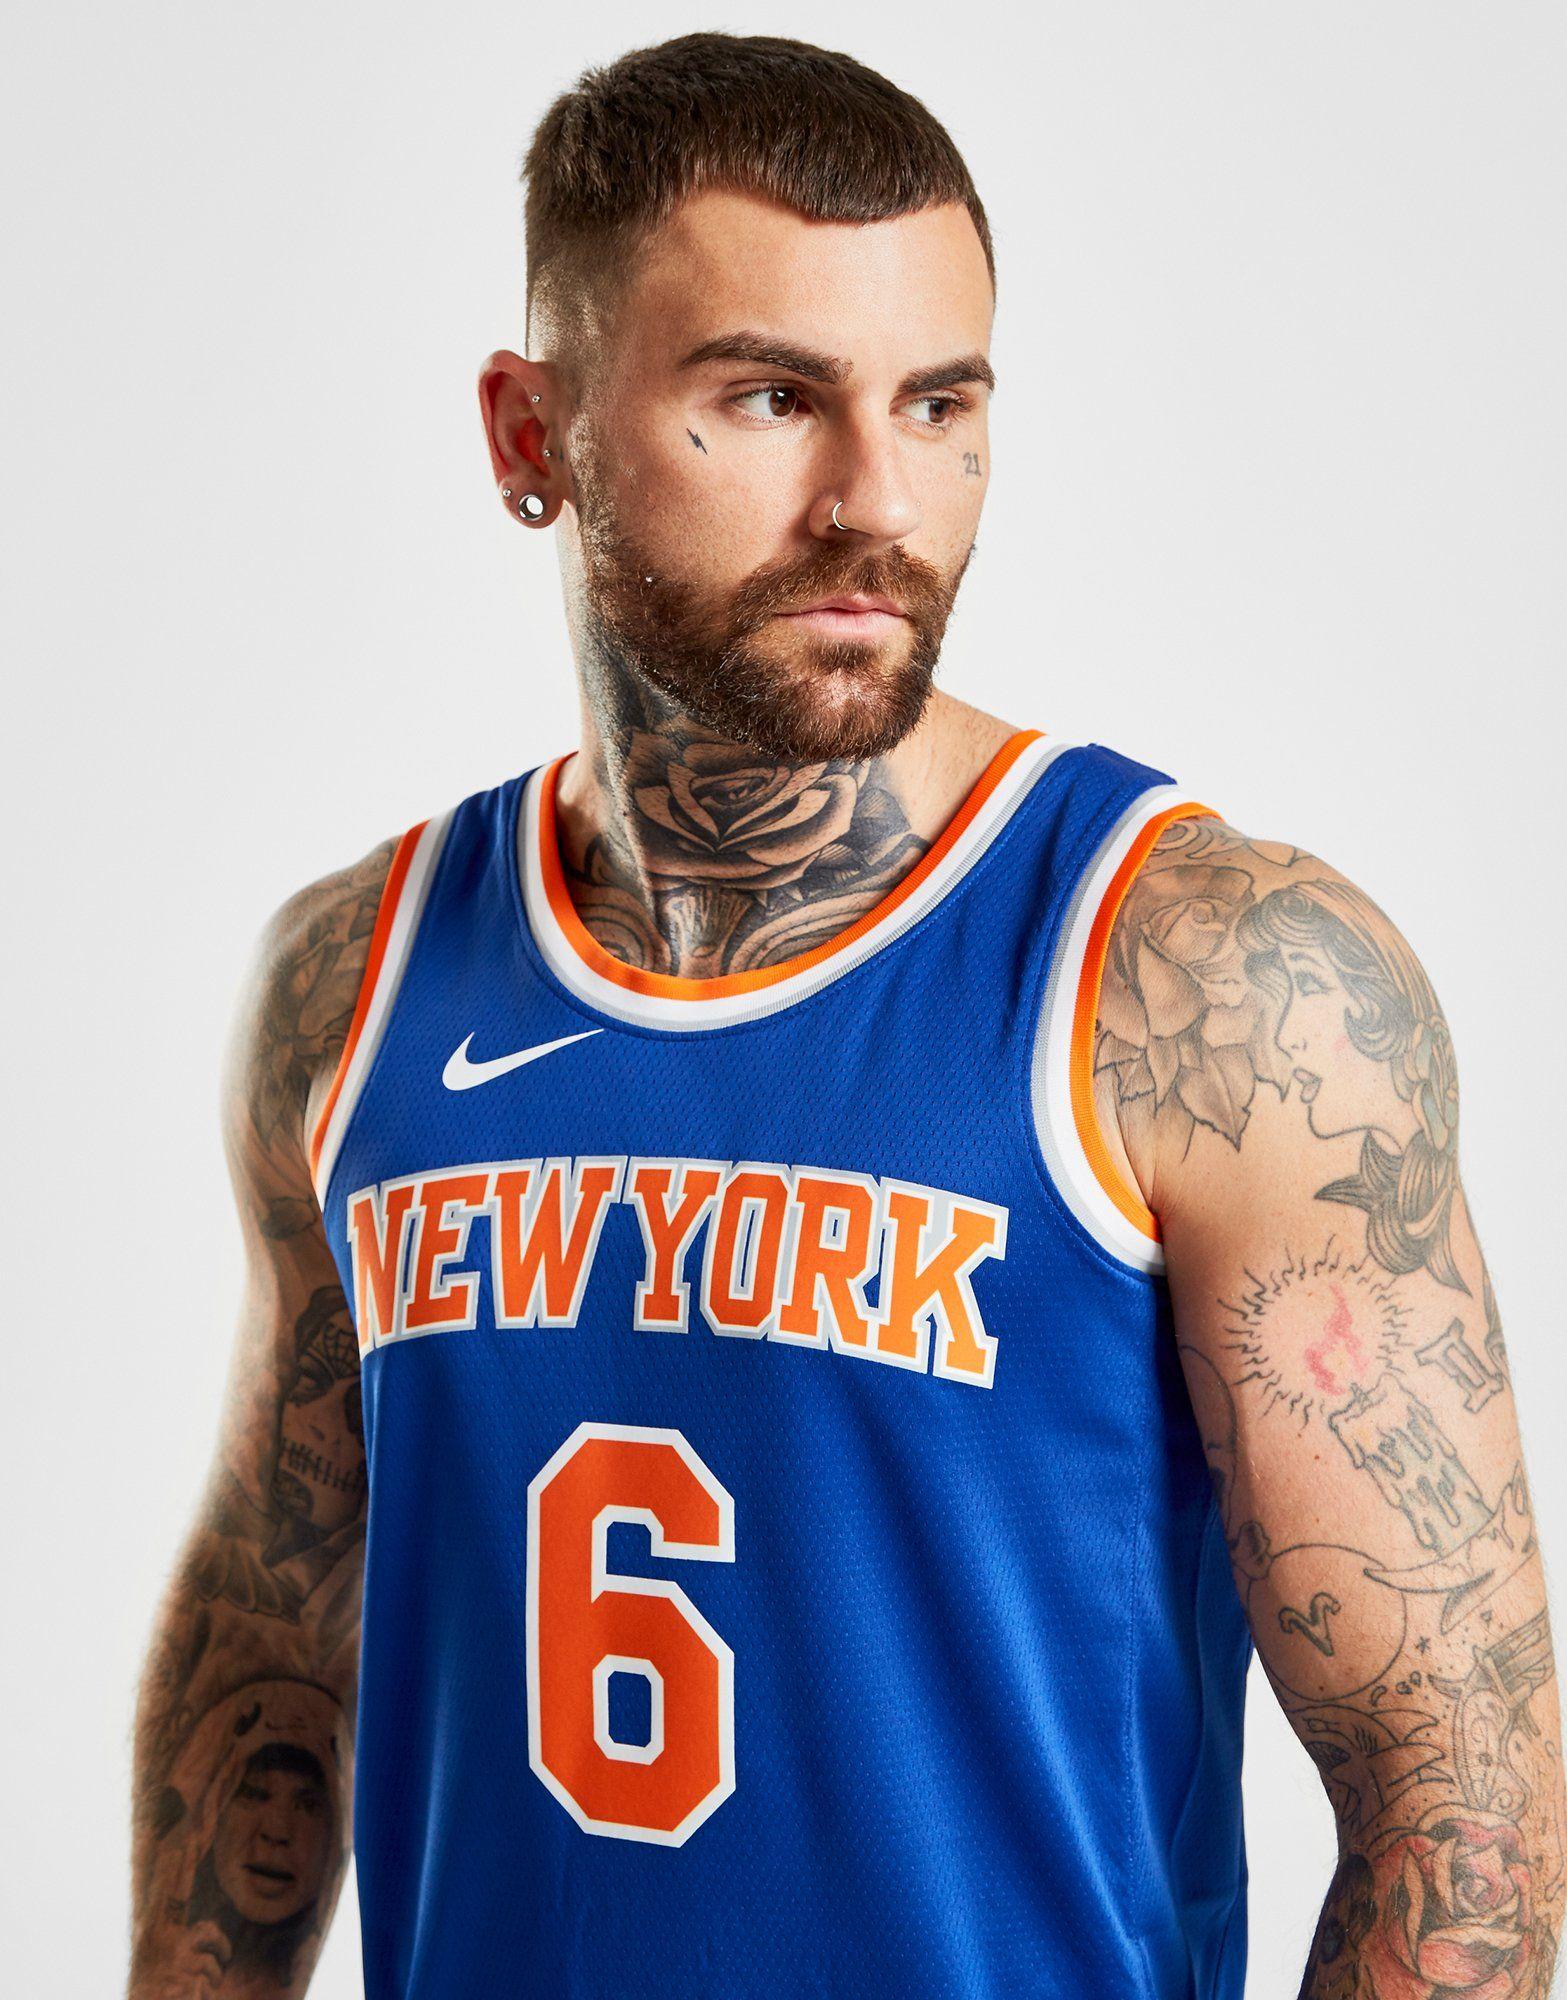 Nike NBA New York Knicks Swingman Jersey